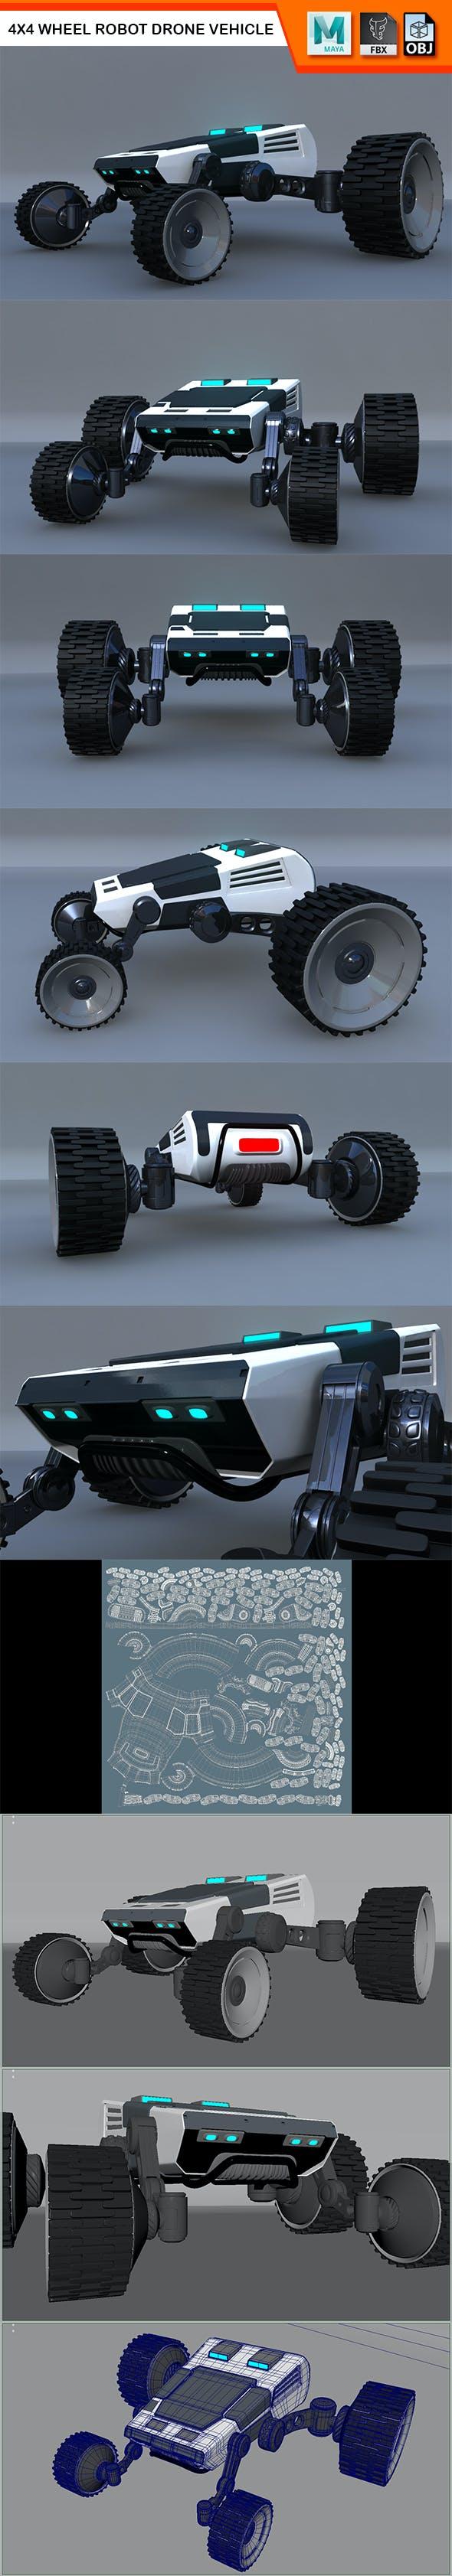 4X4 Wheel Robot Drone Model - 3DOcean Item for Sale